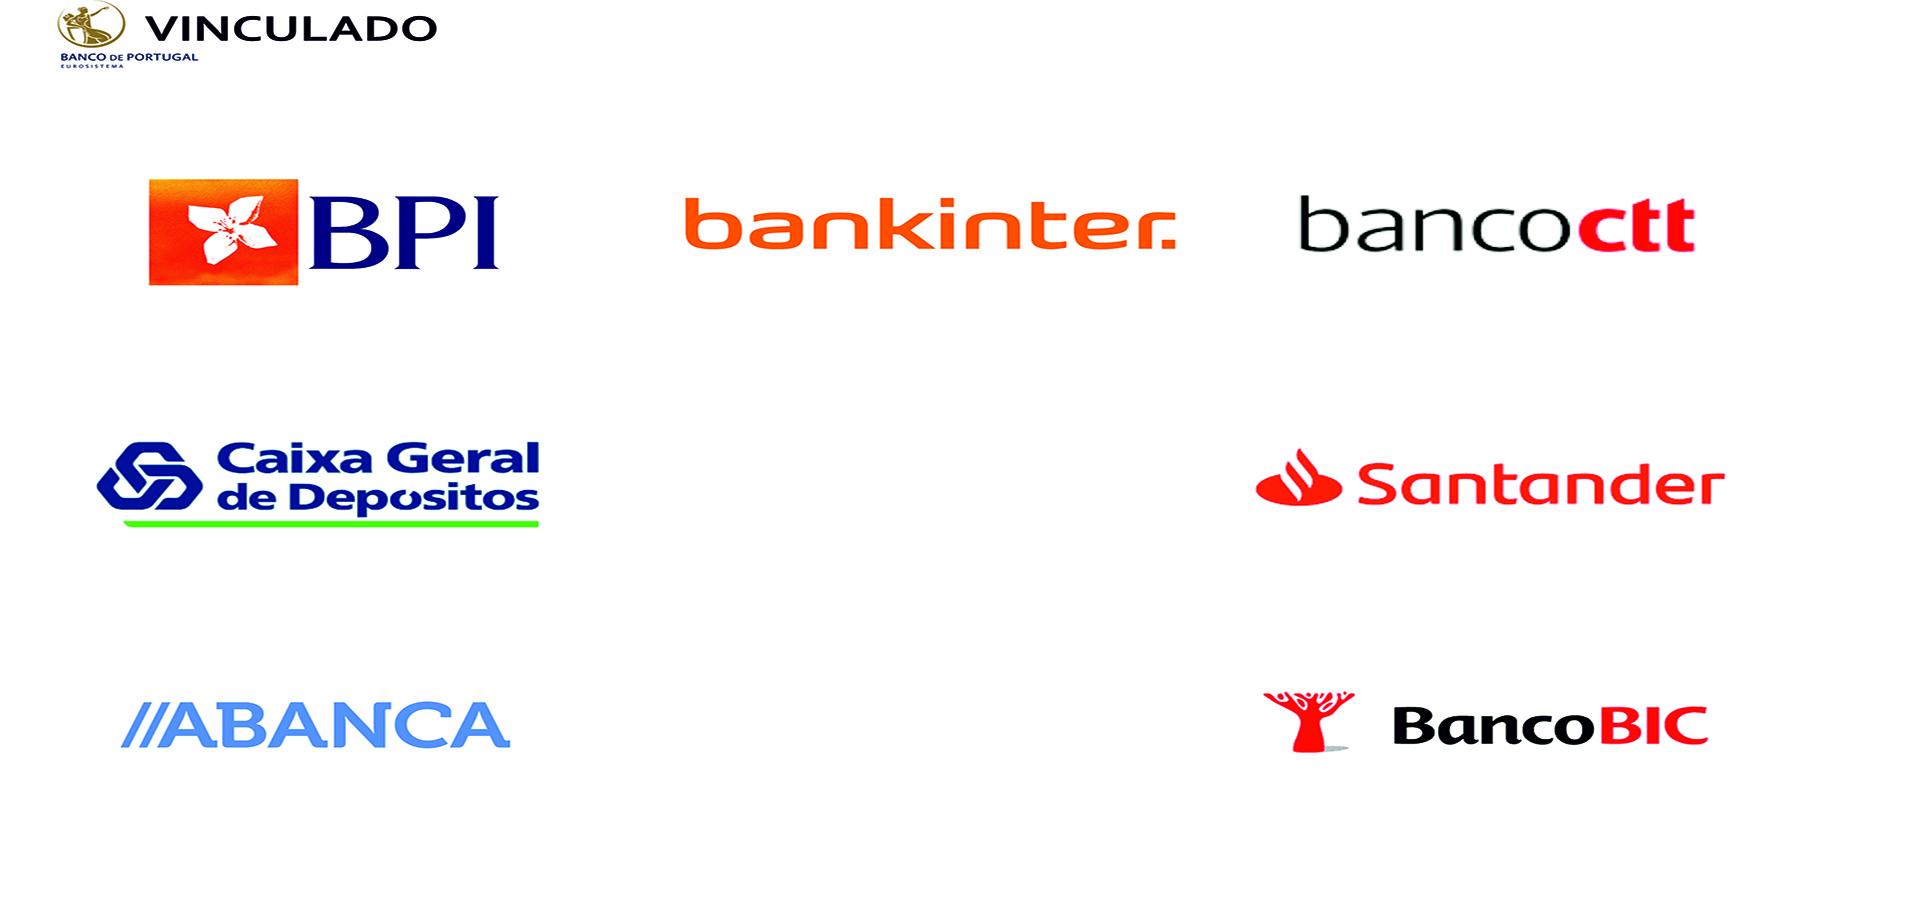 Банк Португалии